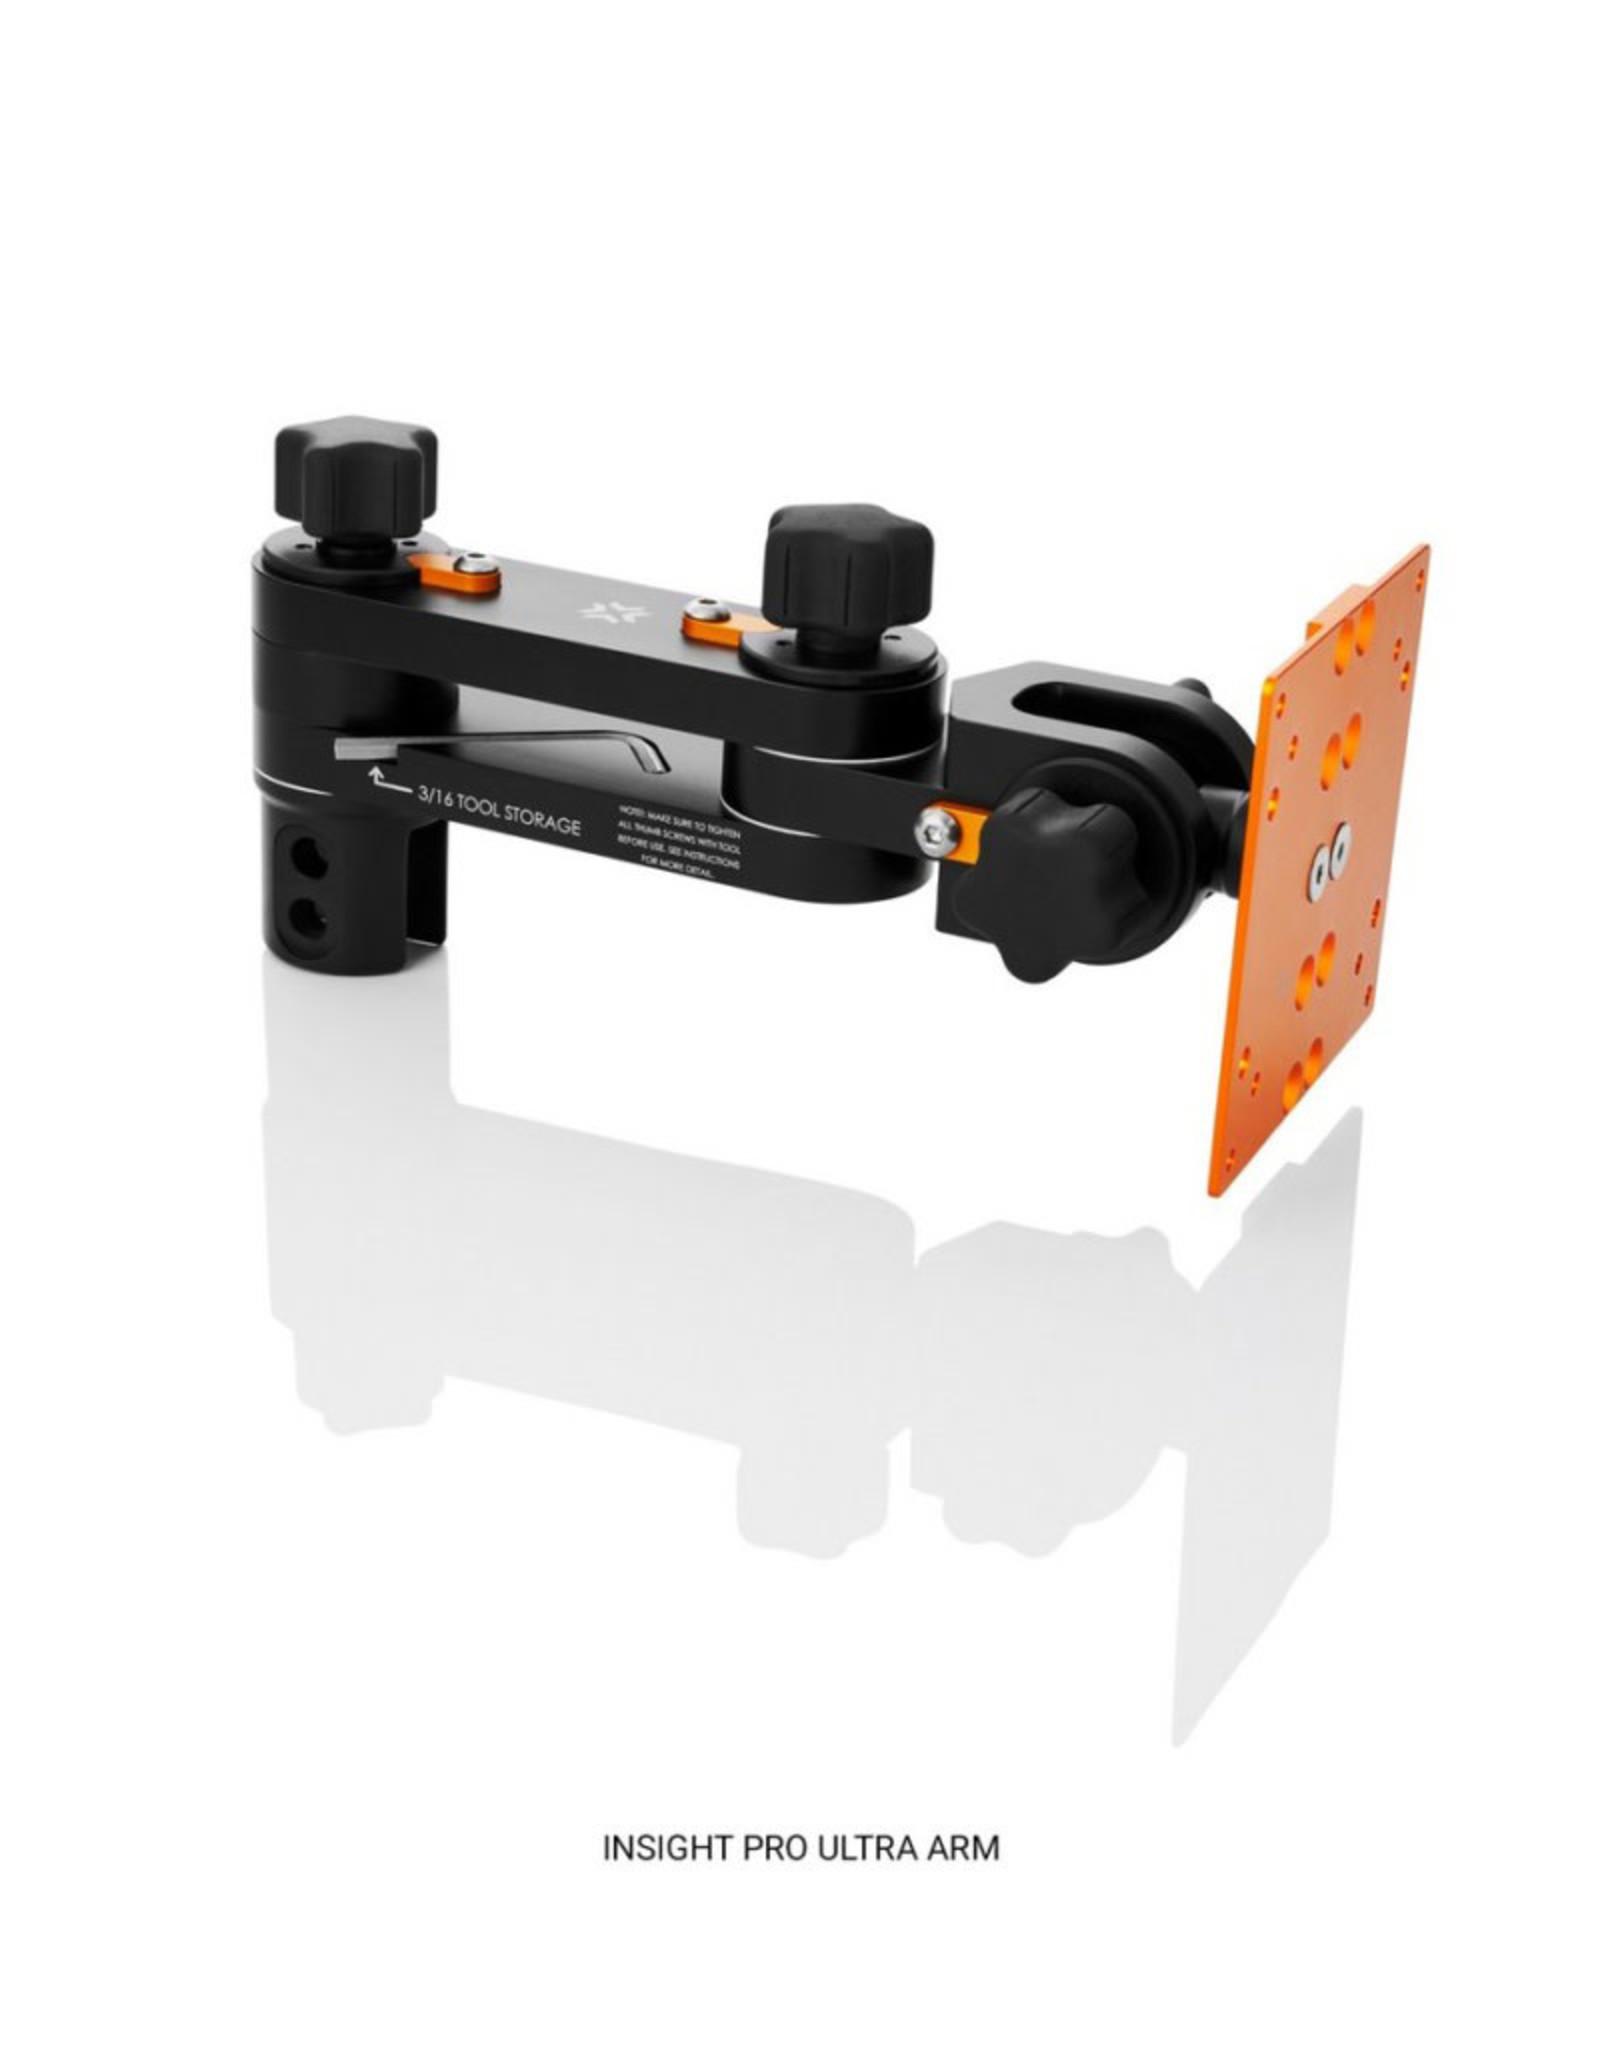 Inovativ Inovativ PRO ULTRA ARM FOR INSIGHT MONITOR MOUNT SYSTEM